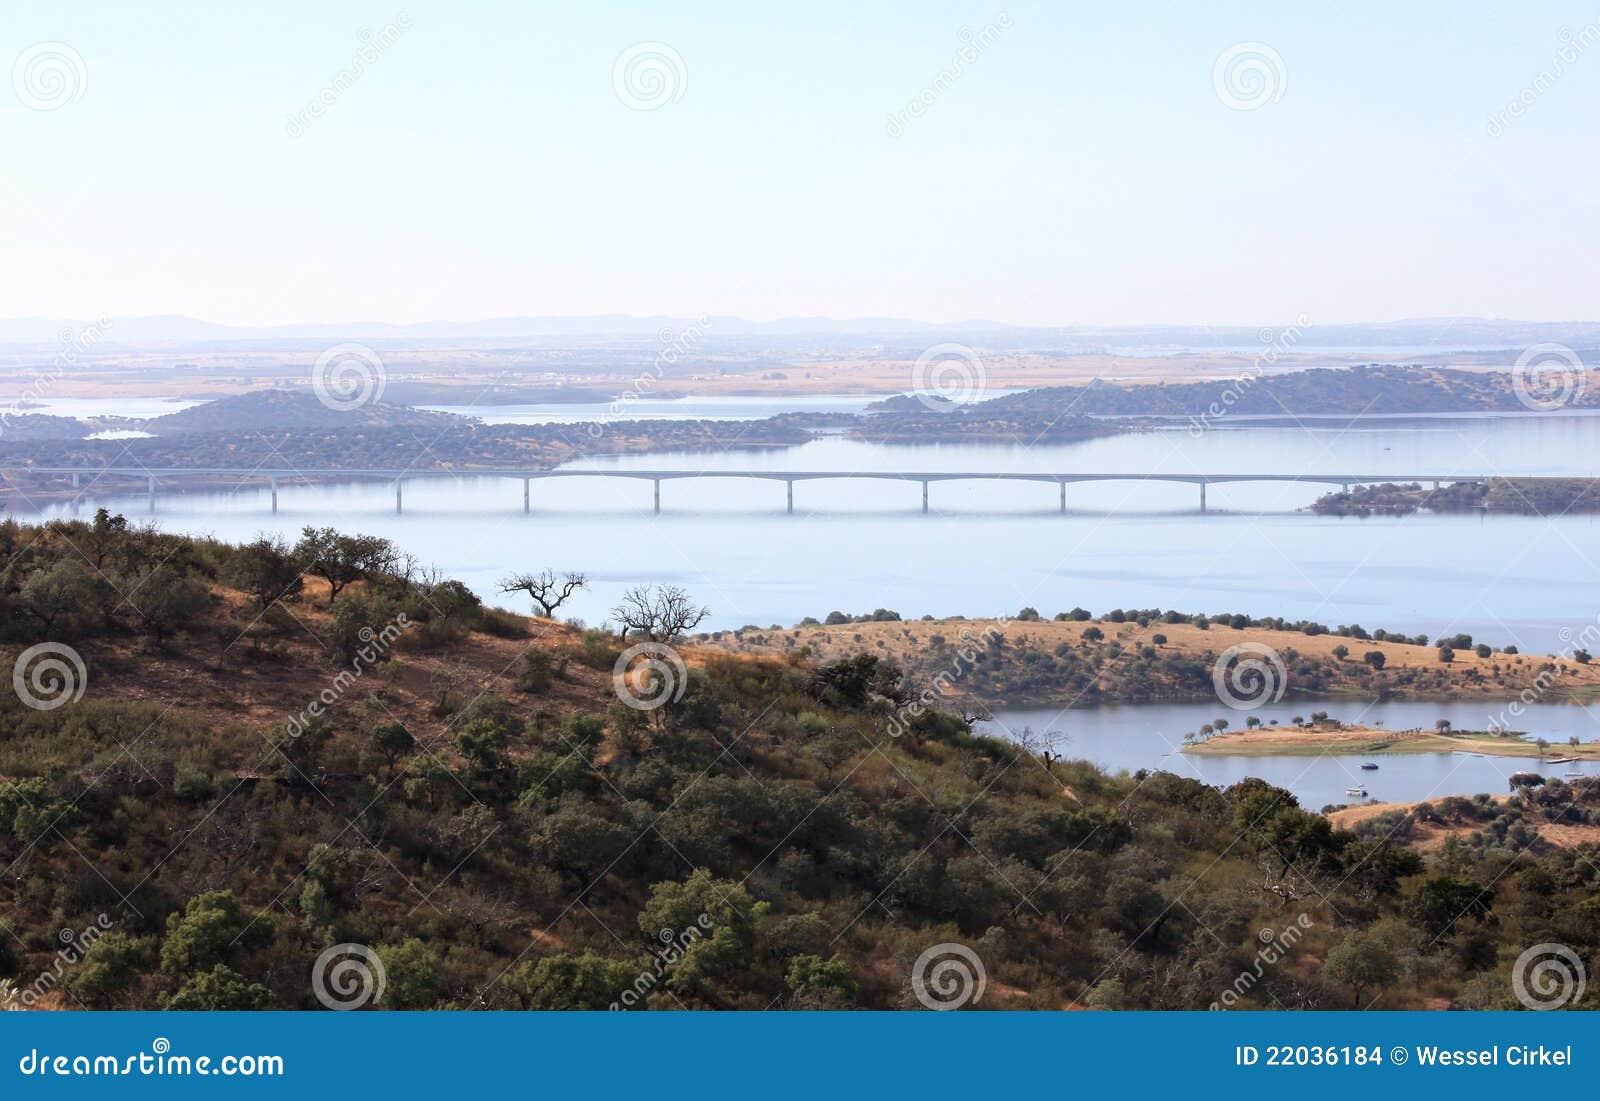 Fluss In Portugal brücke über dem guadiana fluss in portugal stockfoto bild